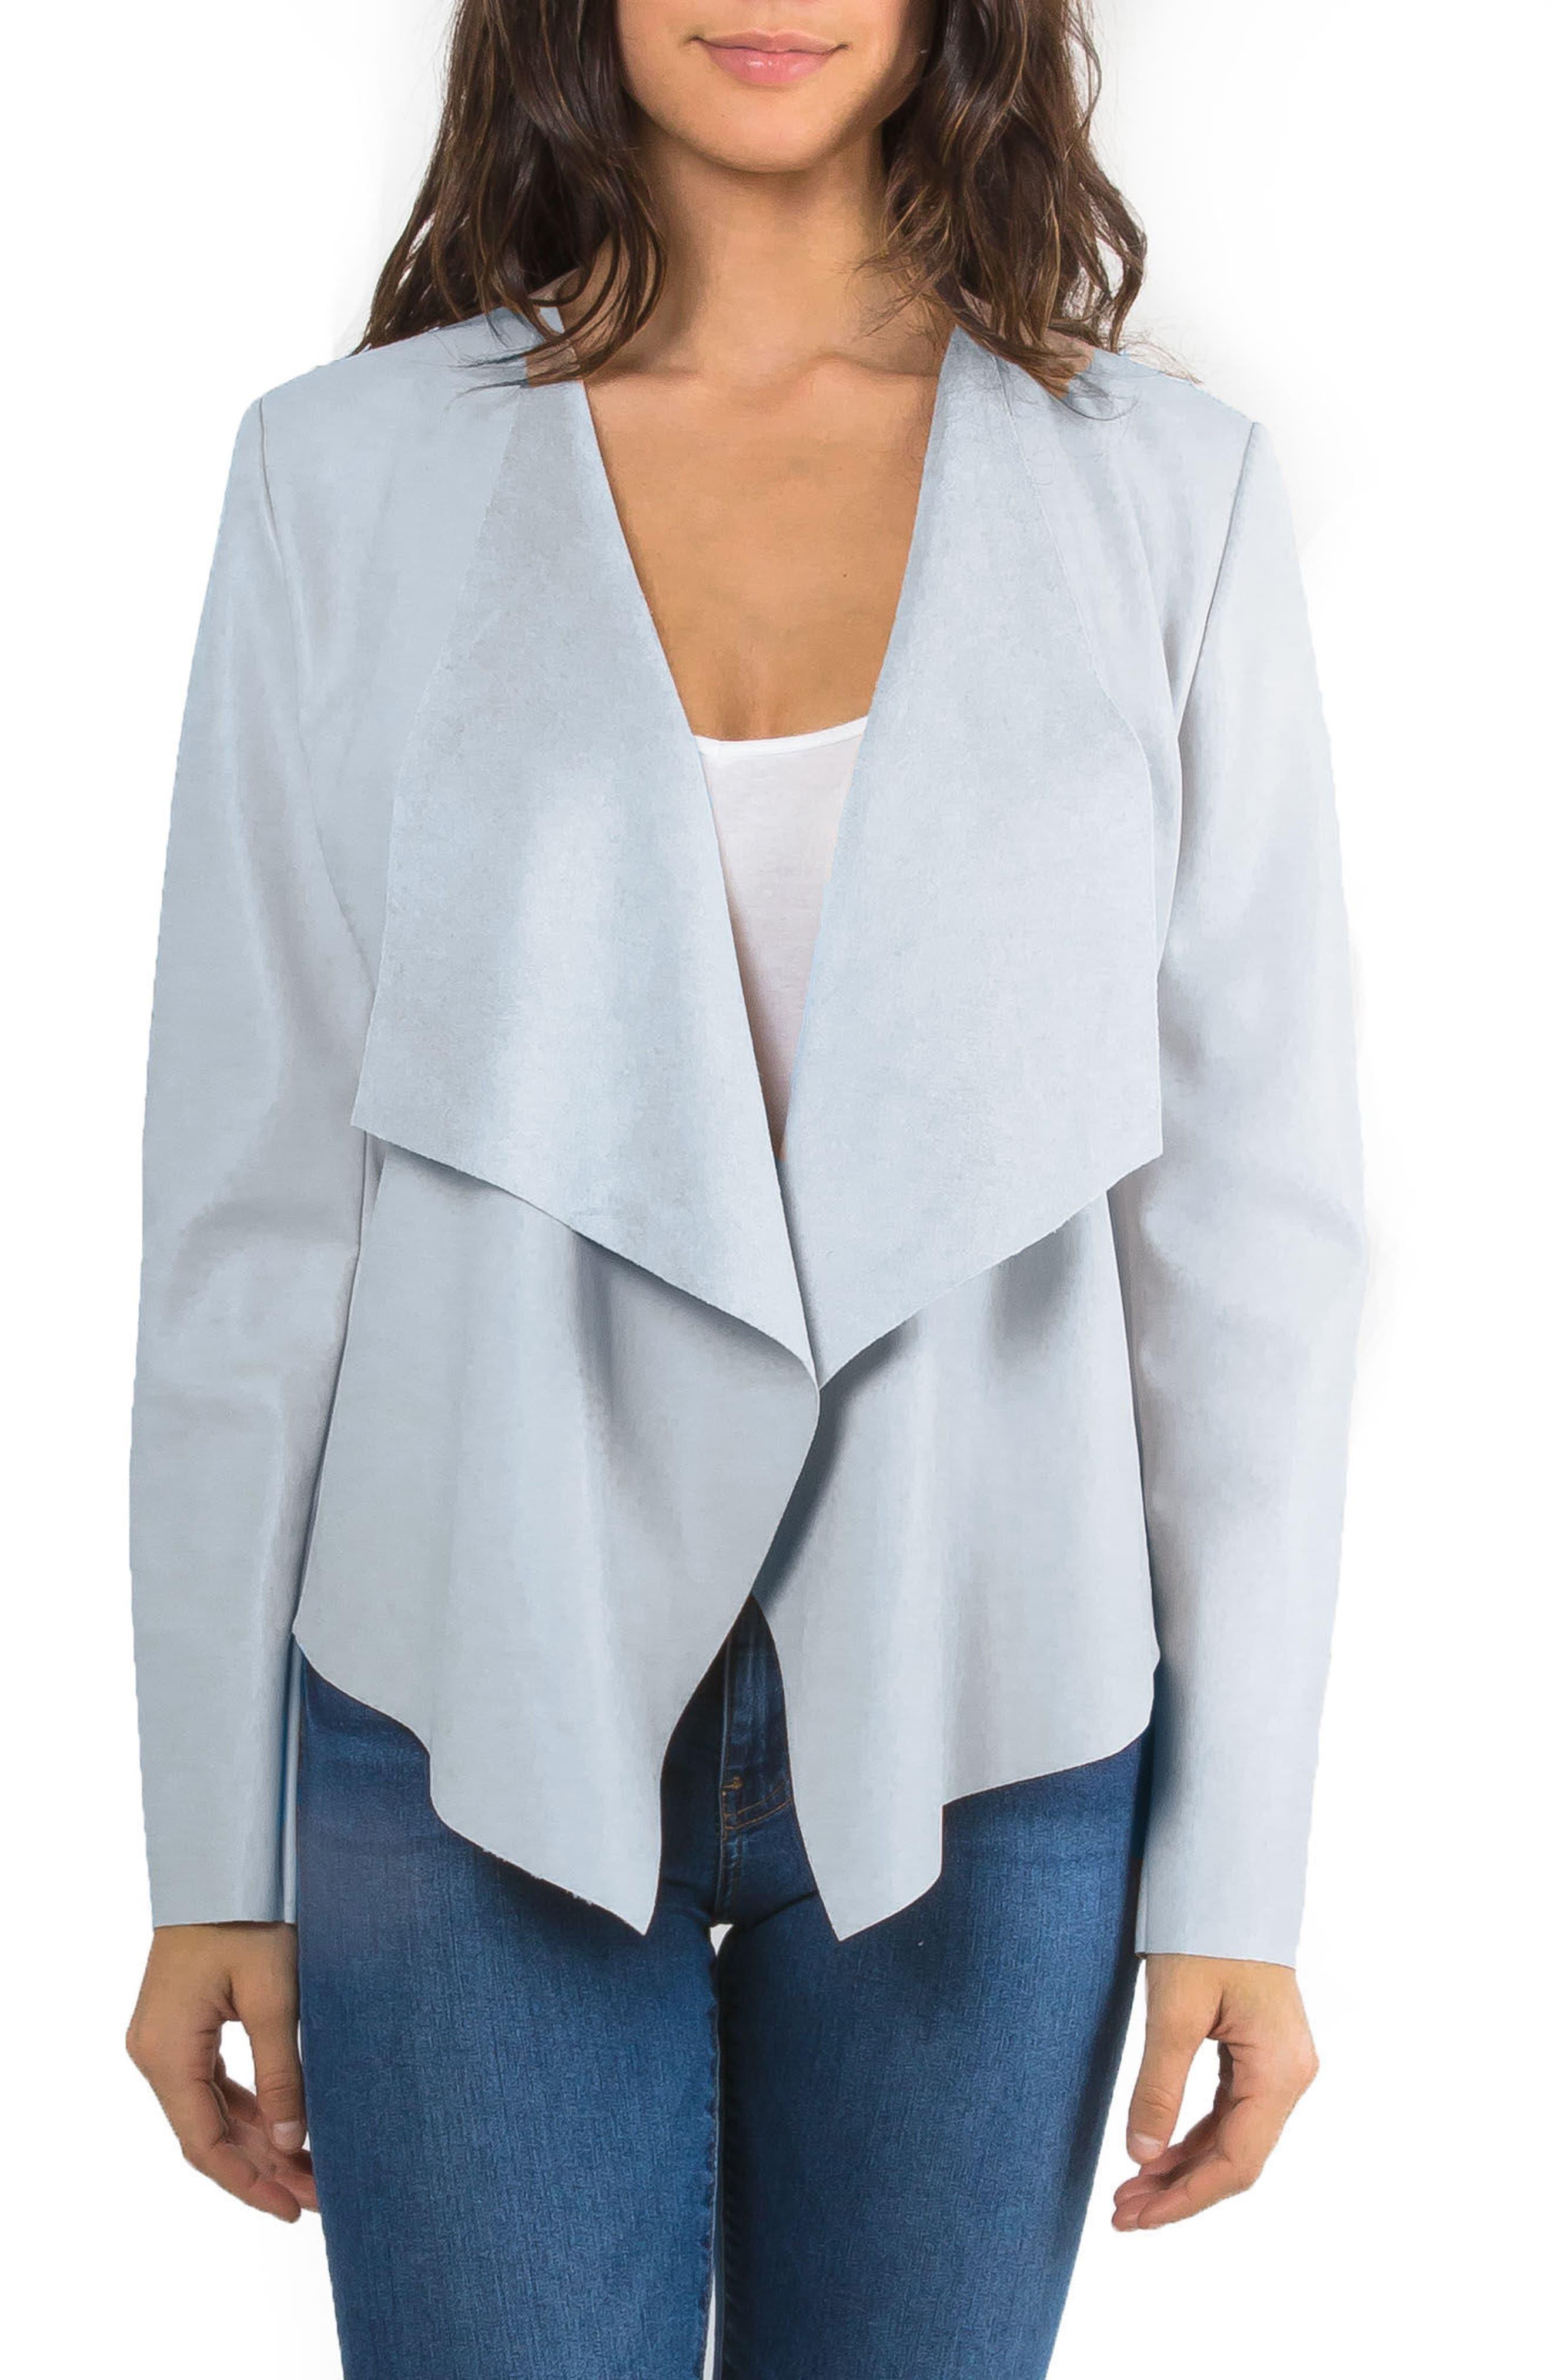 Alternate Image 1 Selected - Bagatelle Drape Faux Leather Jacket